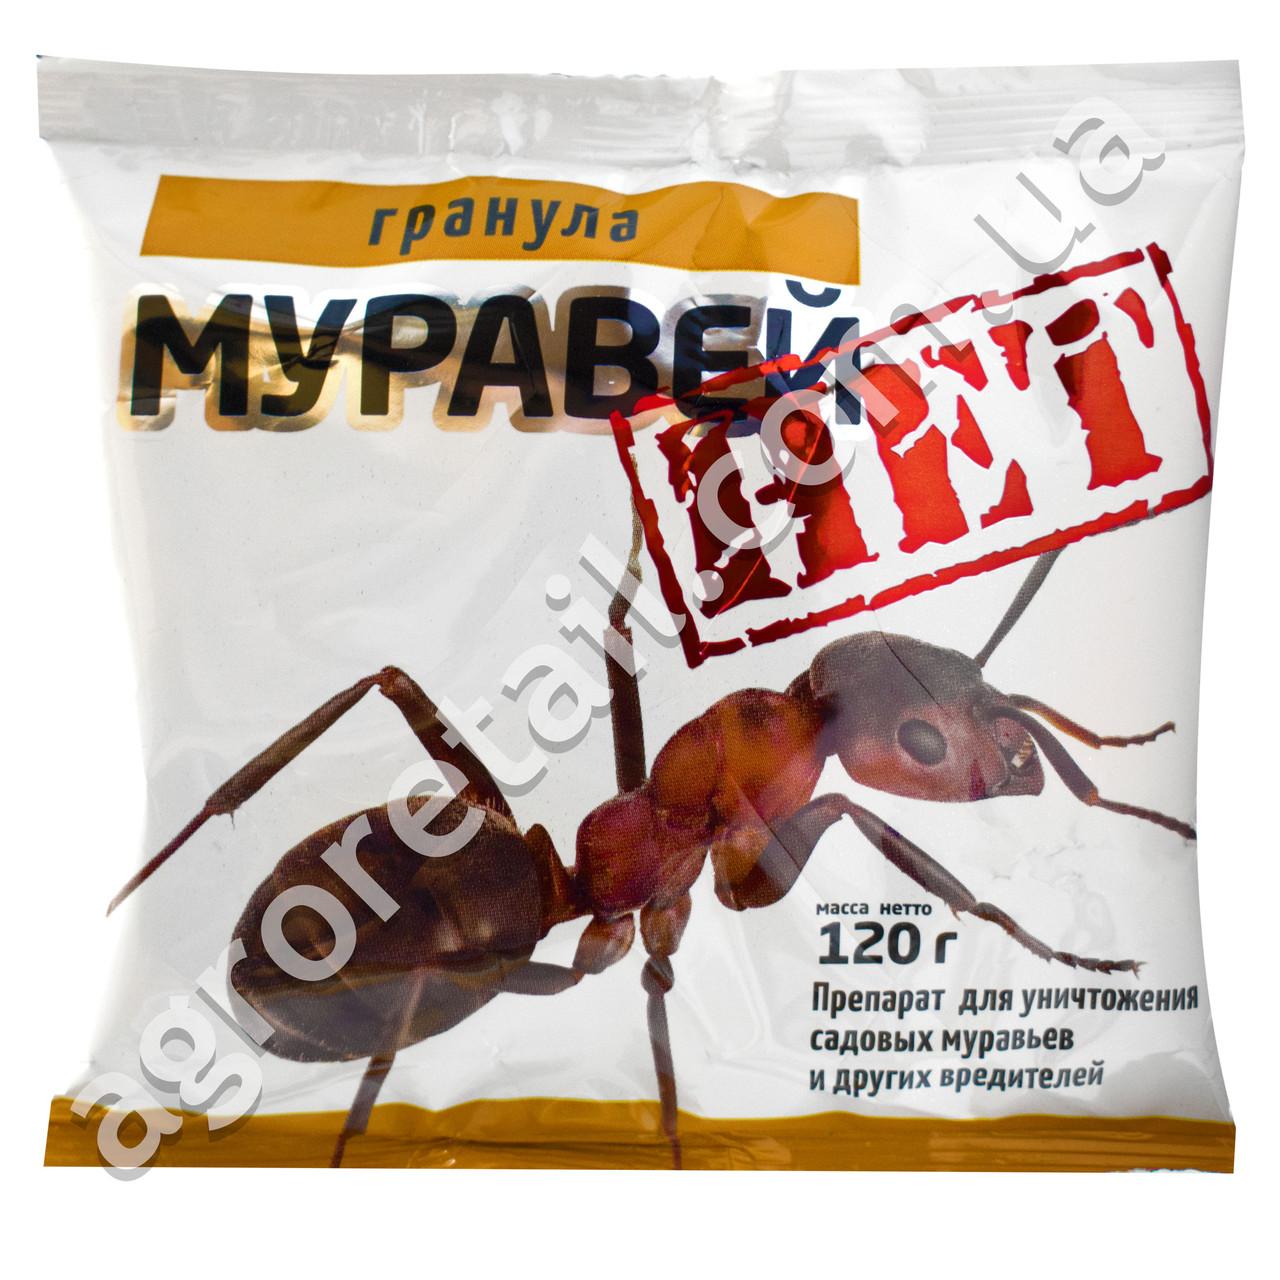 Гранулы от муравьев Муравей нет 120 г